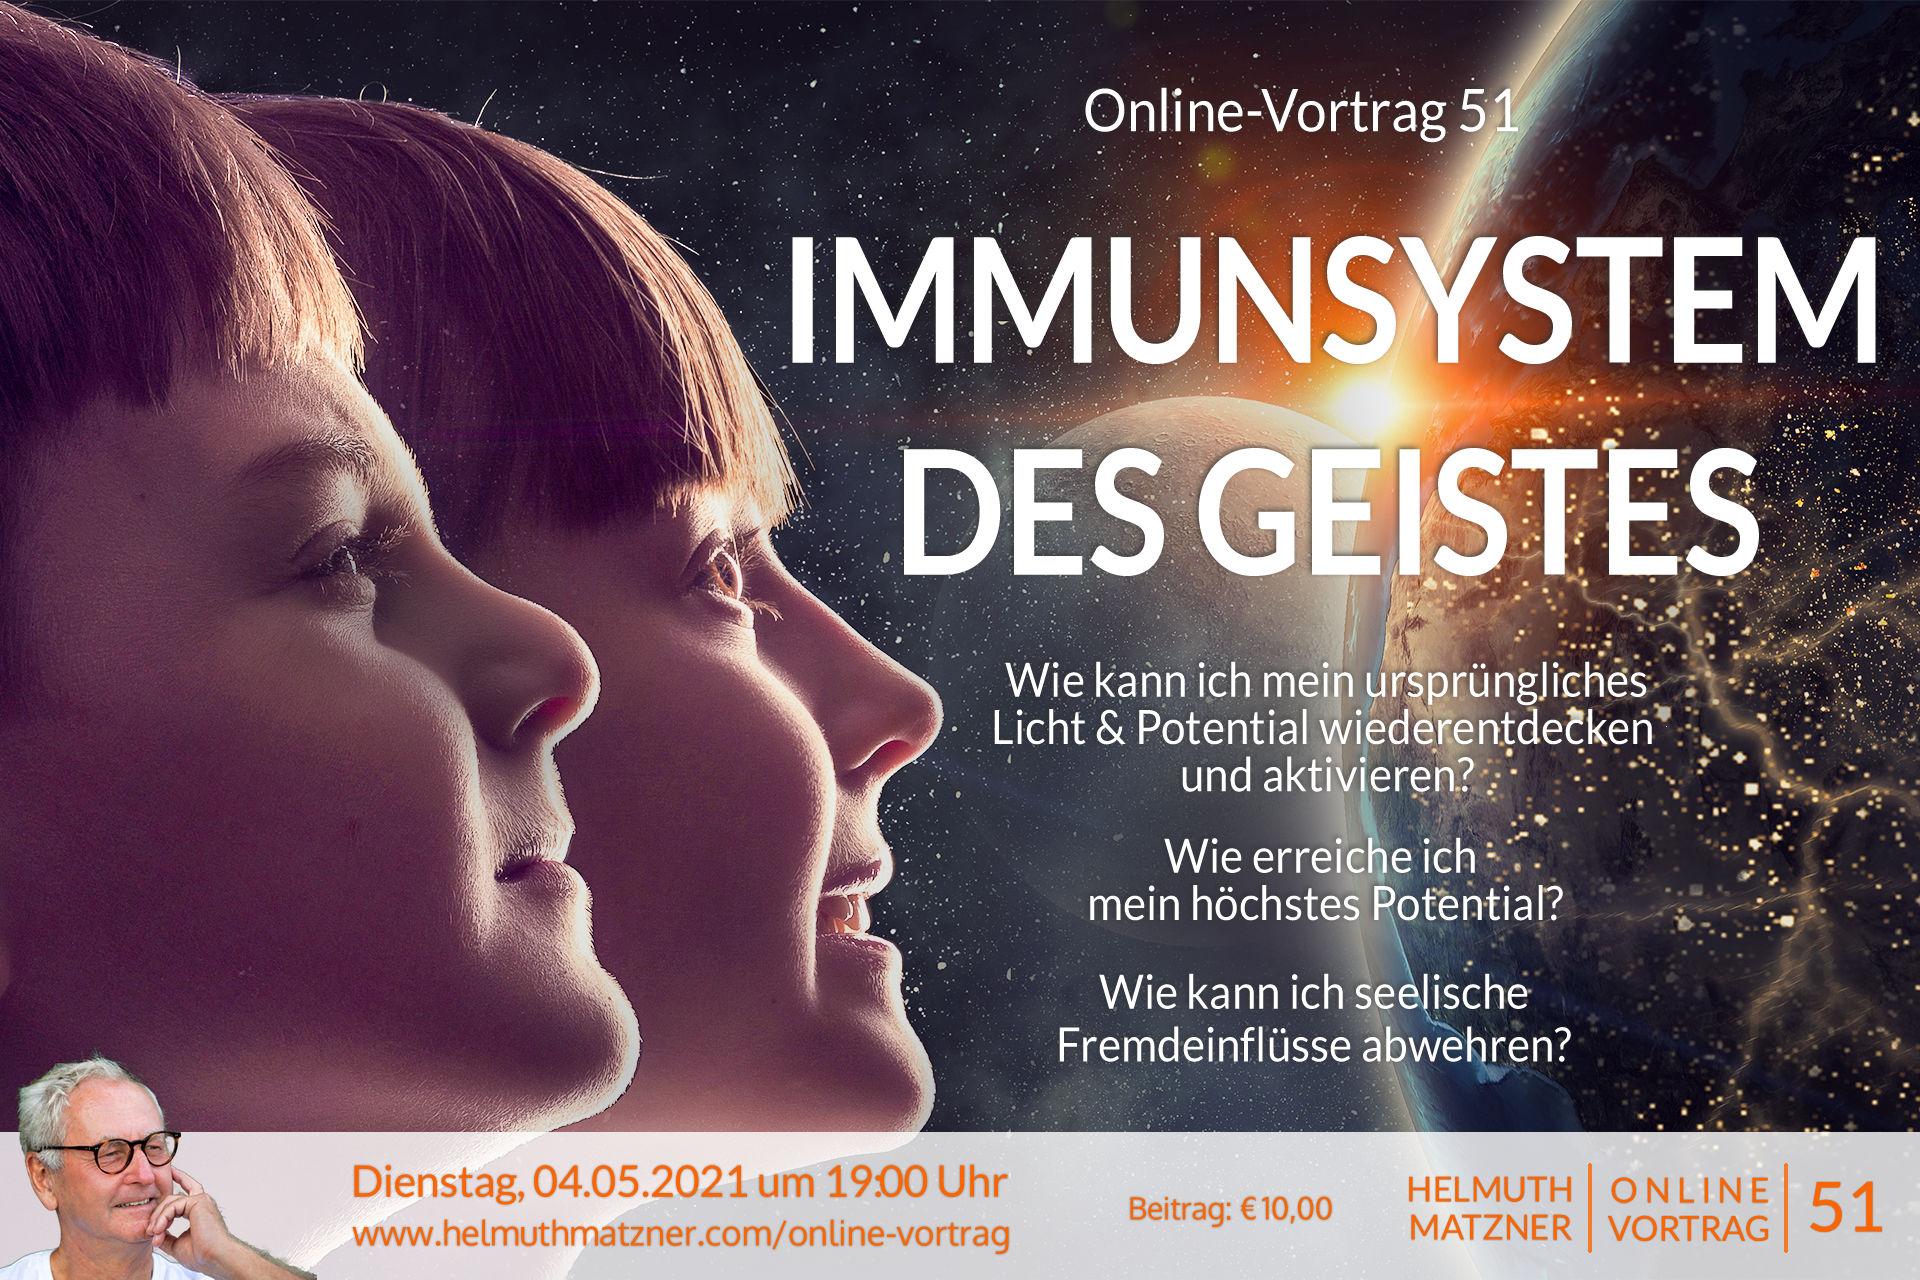 Helmuth Matzner - Online-Vortrag 51 - Höchstes Potential - Banner v01B